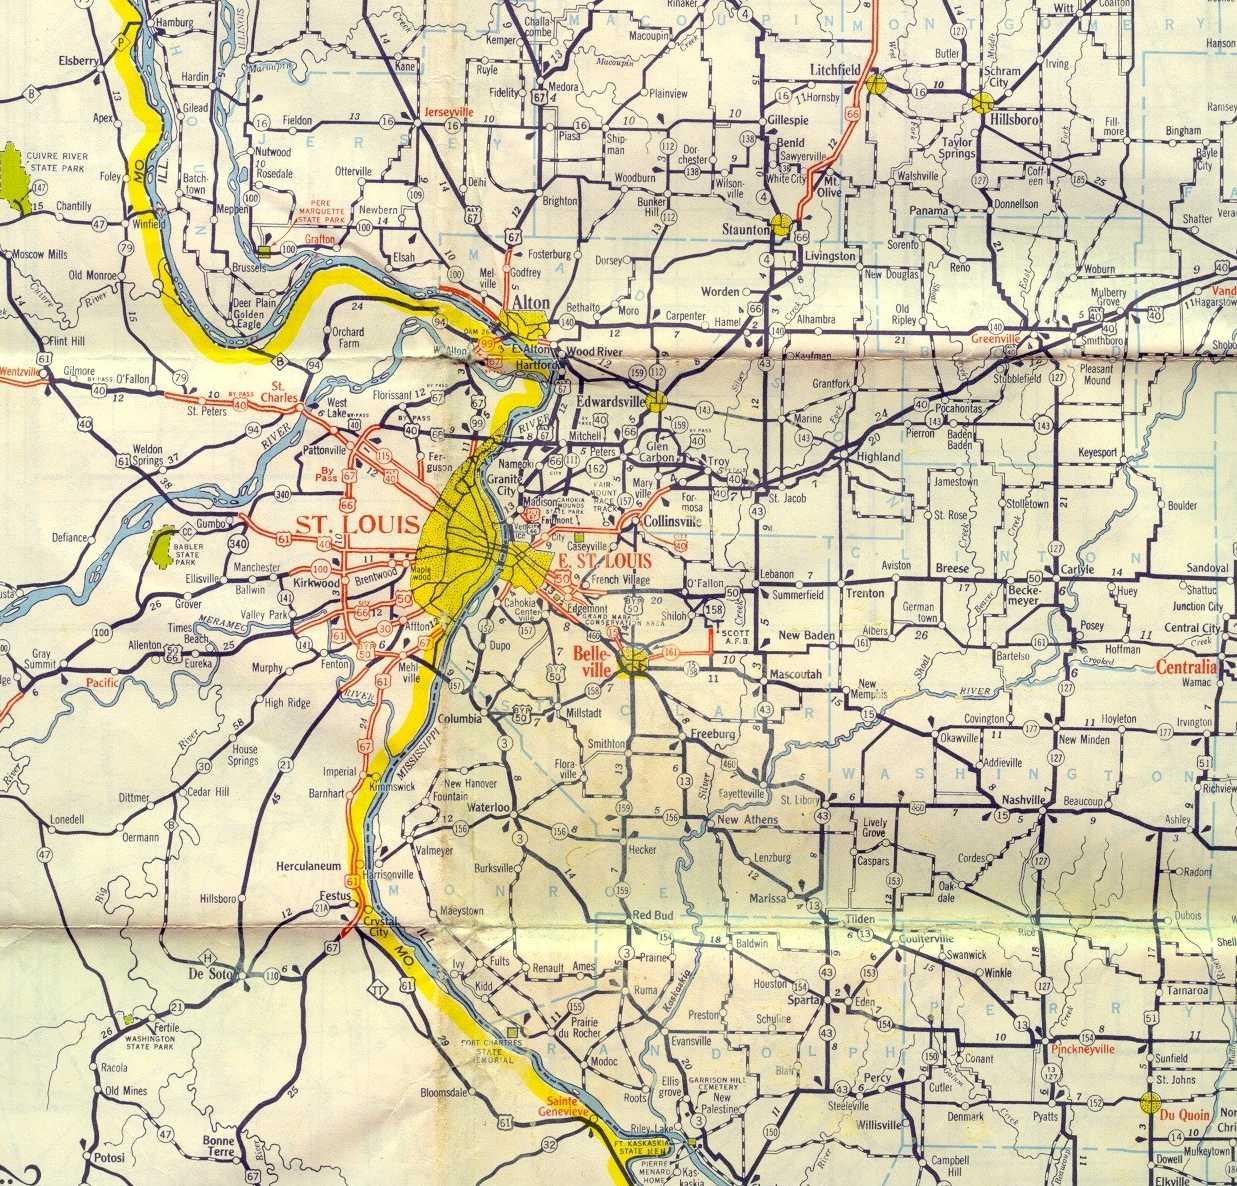 St. Louis Maps Page